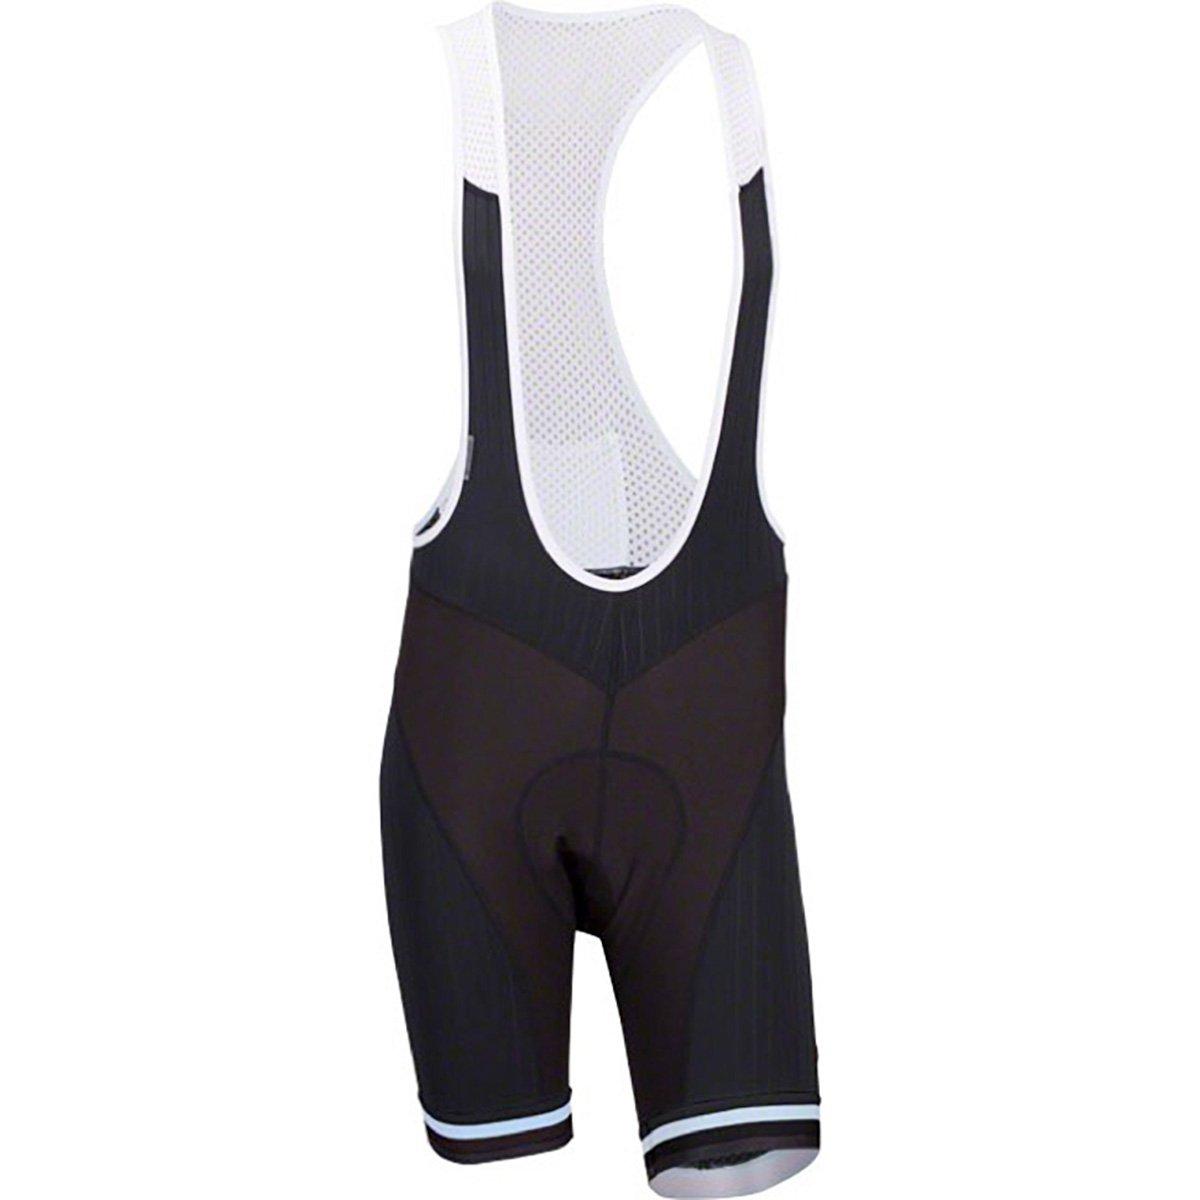 Bellwether 2016 Men's Forza Bib Cycling Shorts - 95697 (White - XXL)